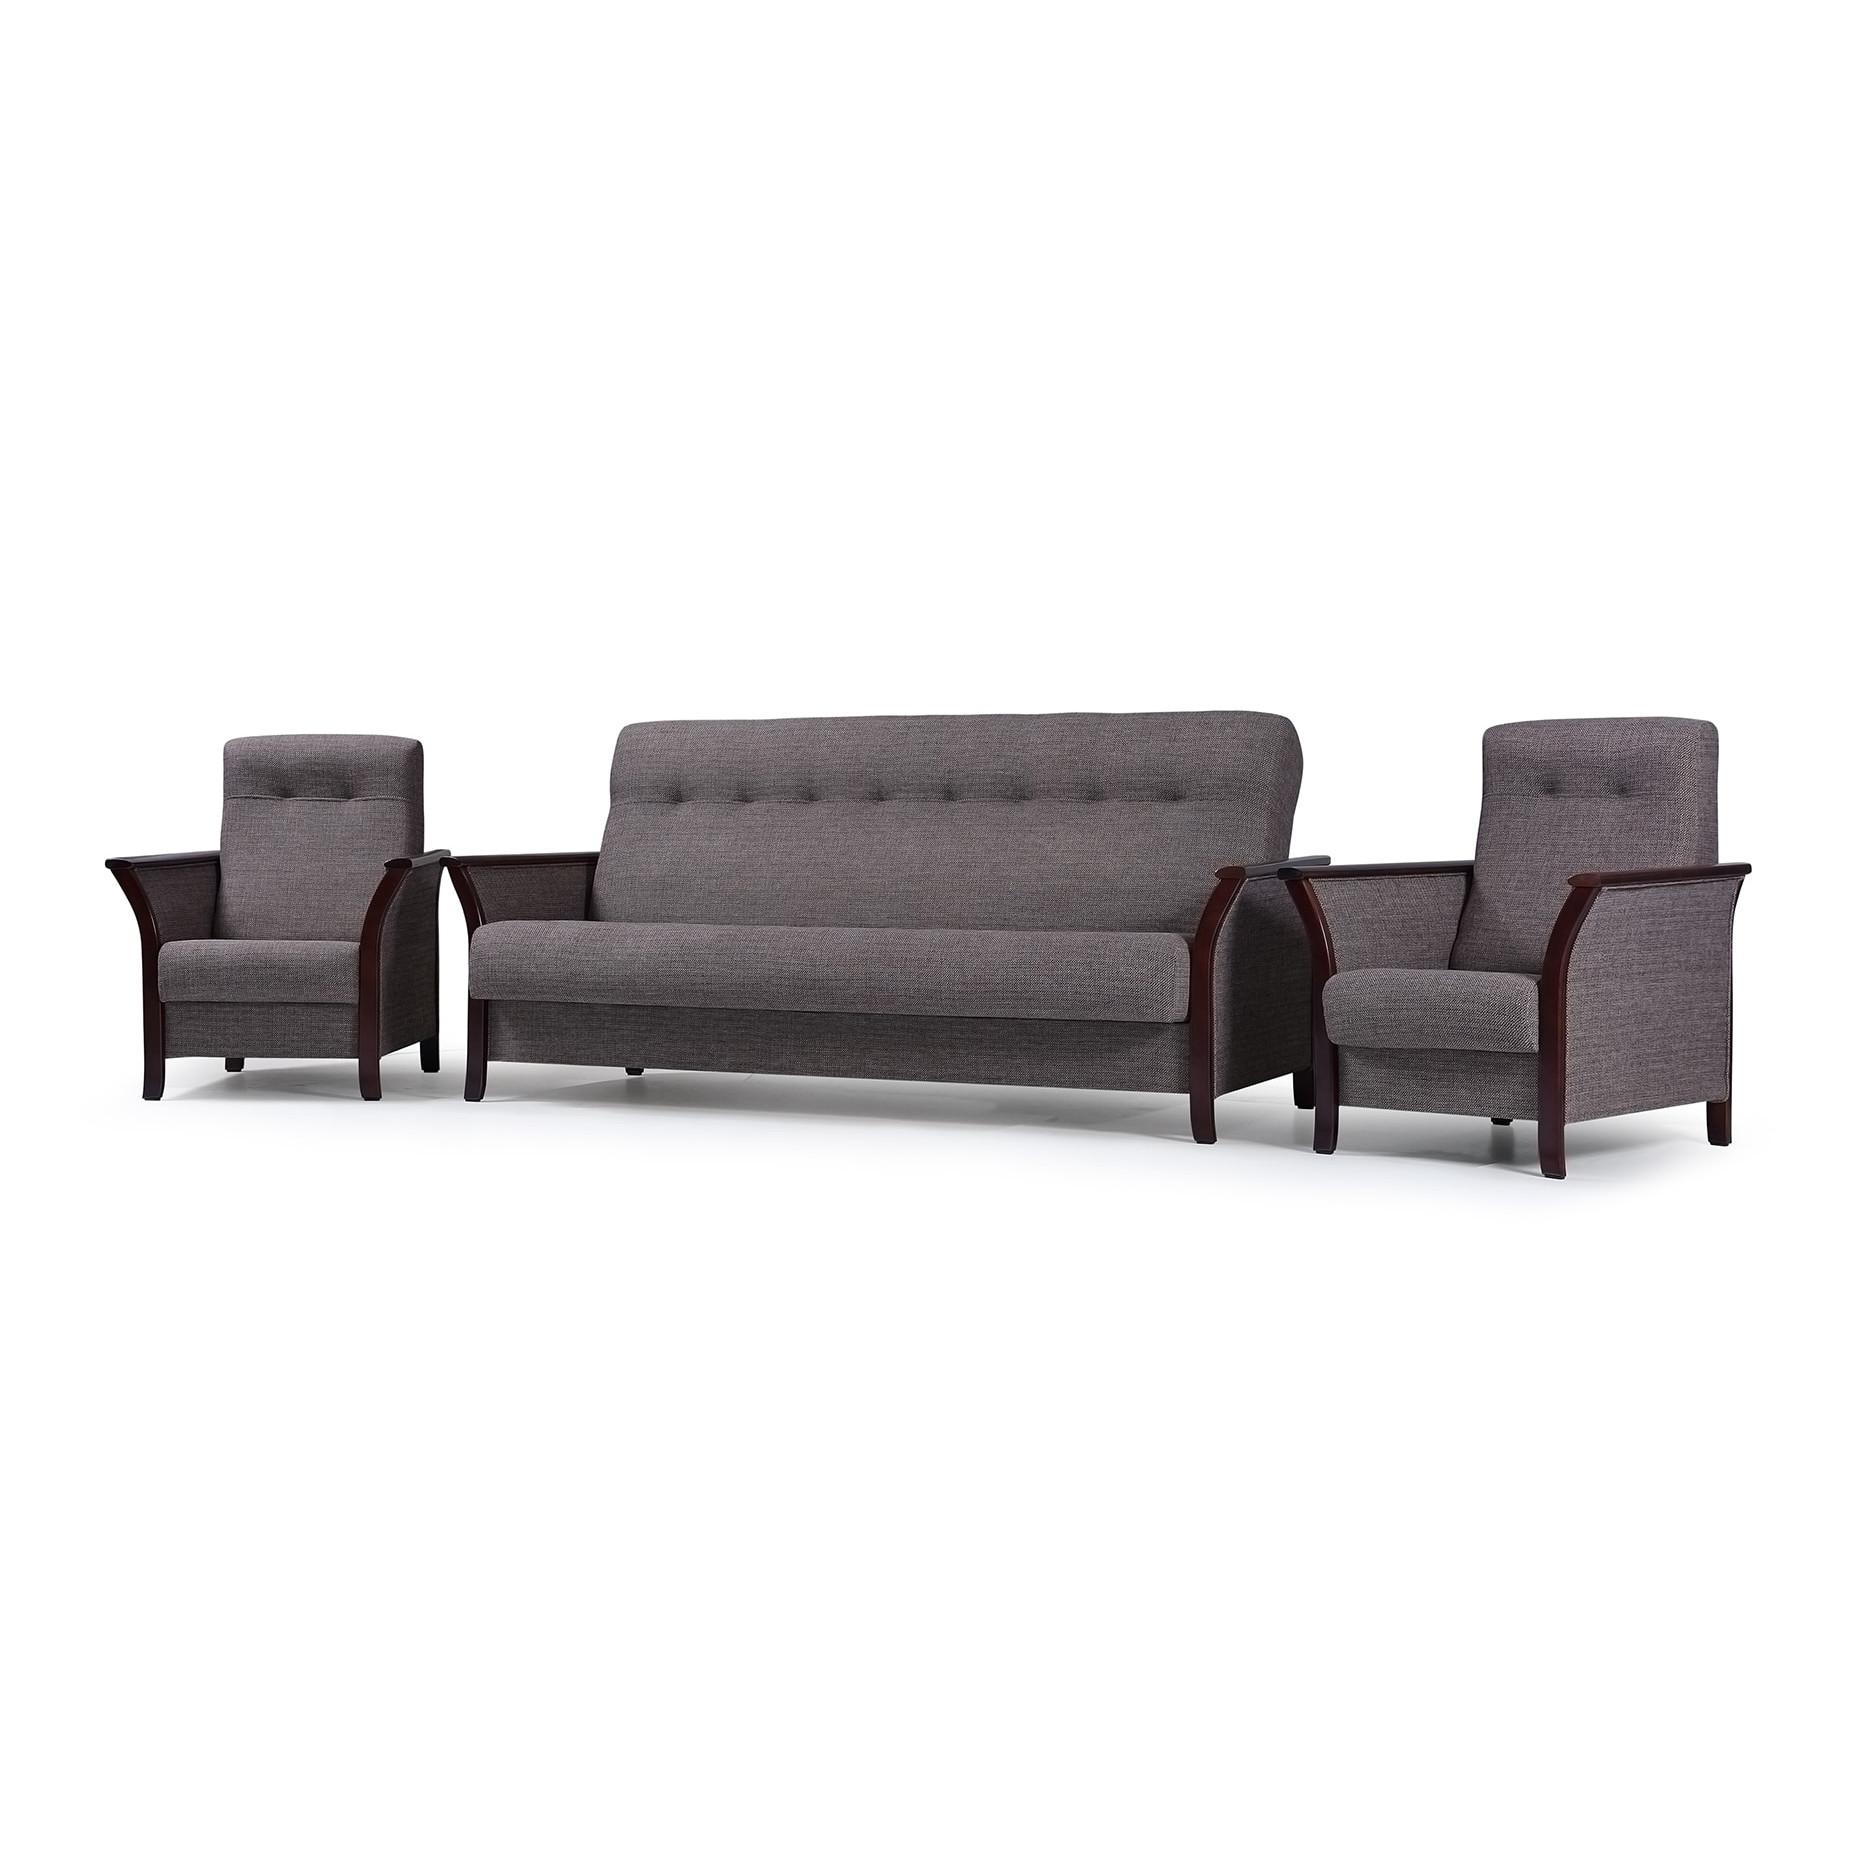 sofa set sofagarnitur couch und 2 sessel farbauswahl grau wohnzimmer barbados ebay. Black Bedroom Furniture Sets. Home Design Ideas